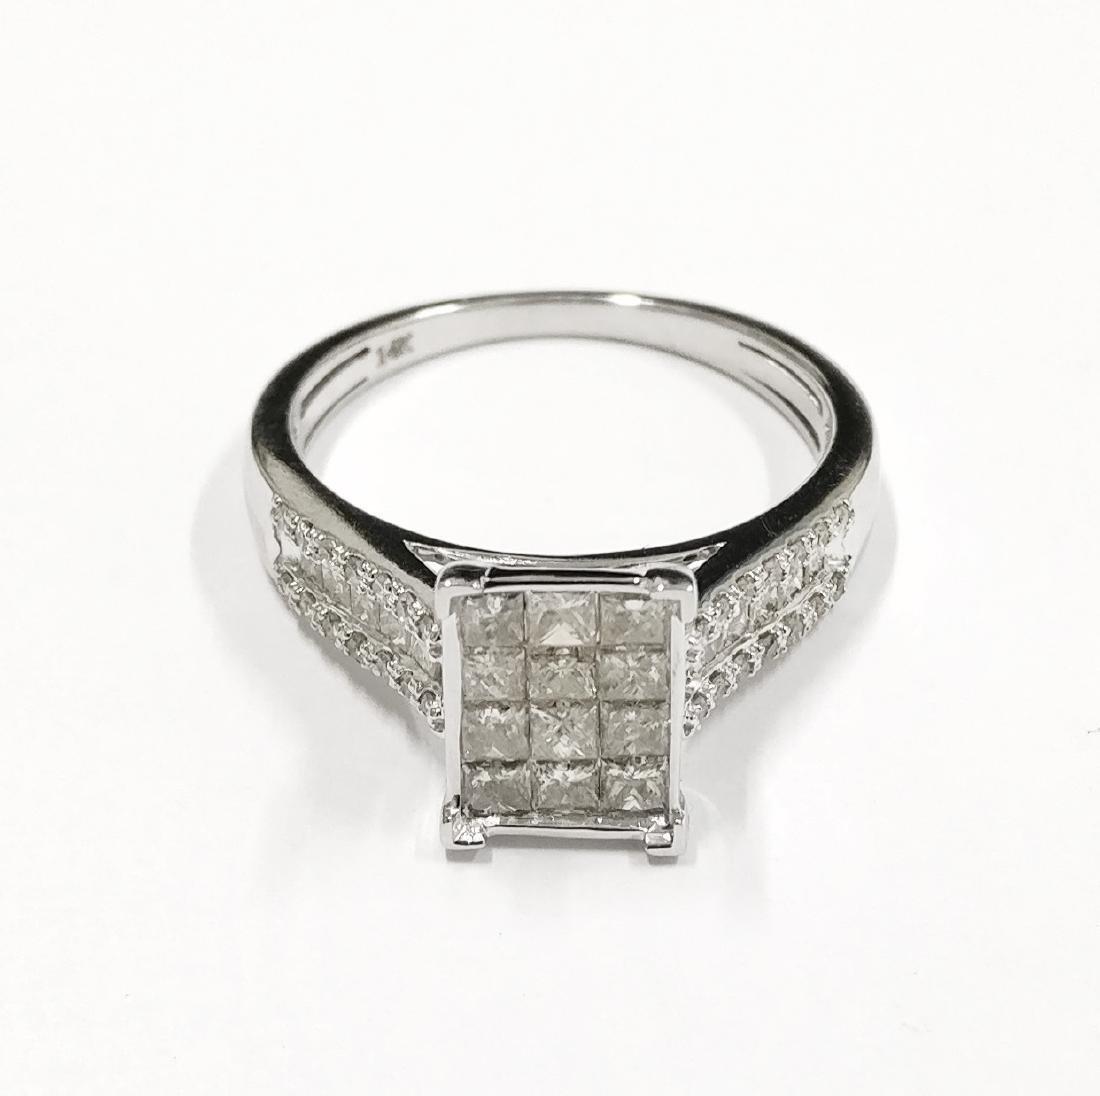 14k Gold New Ladies Diamond Ring, 1.22ctw